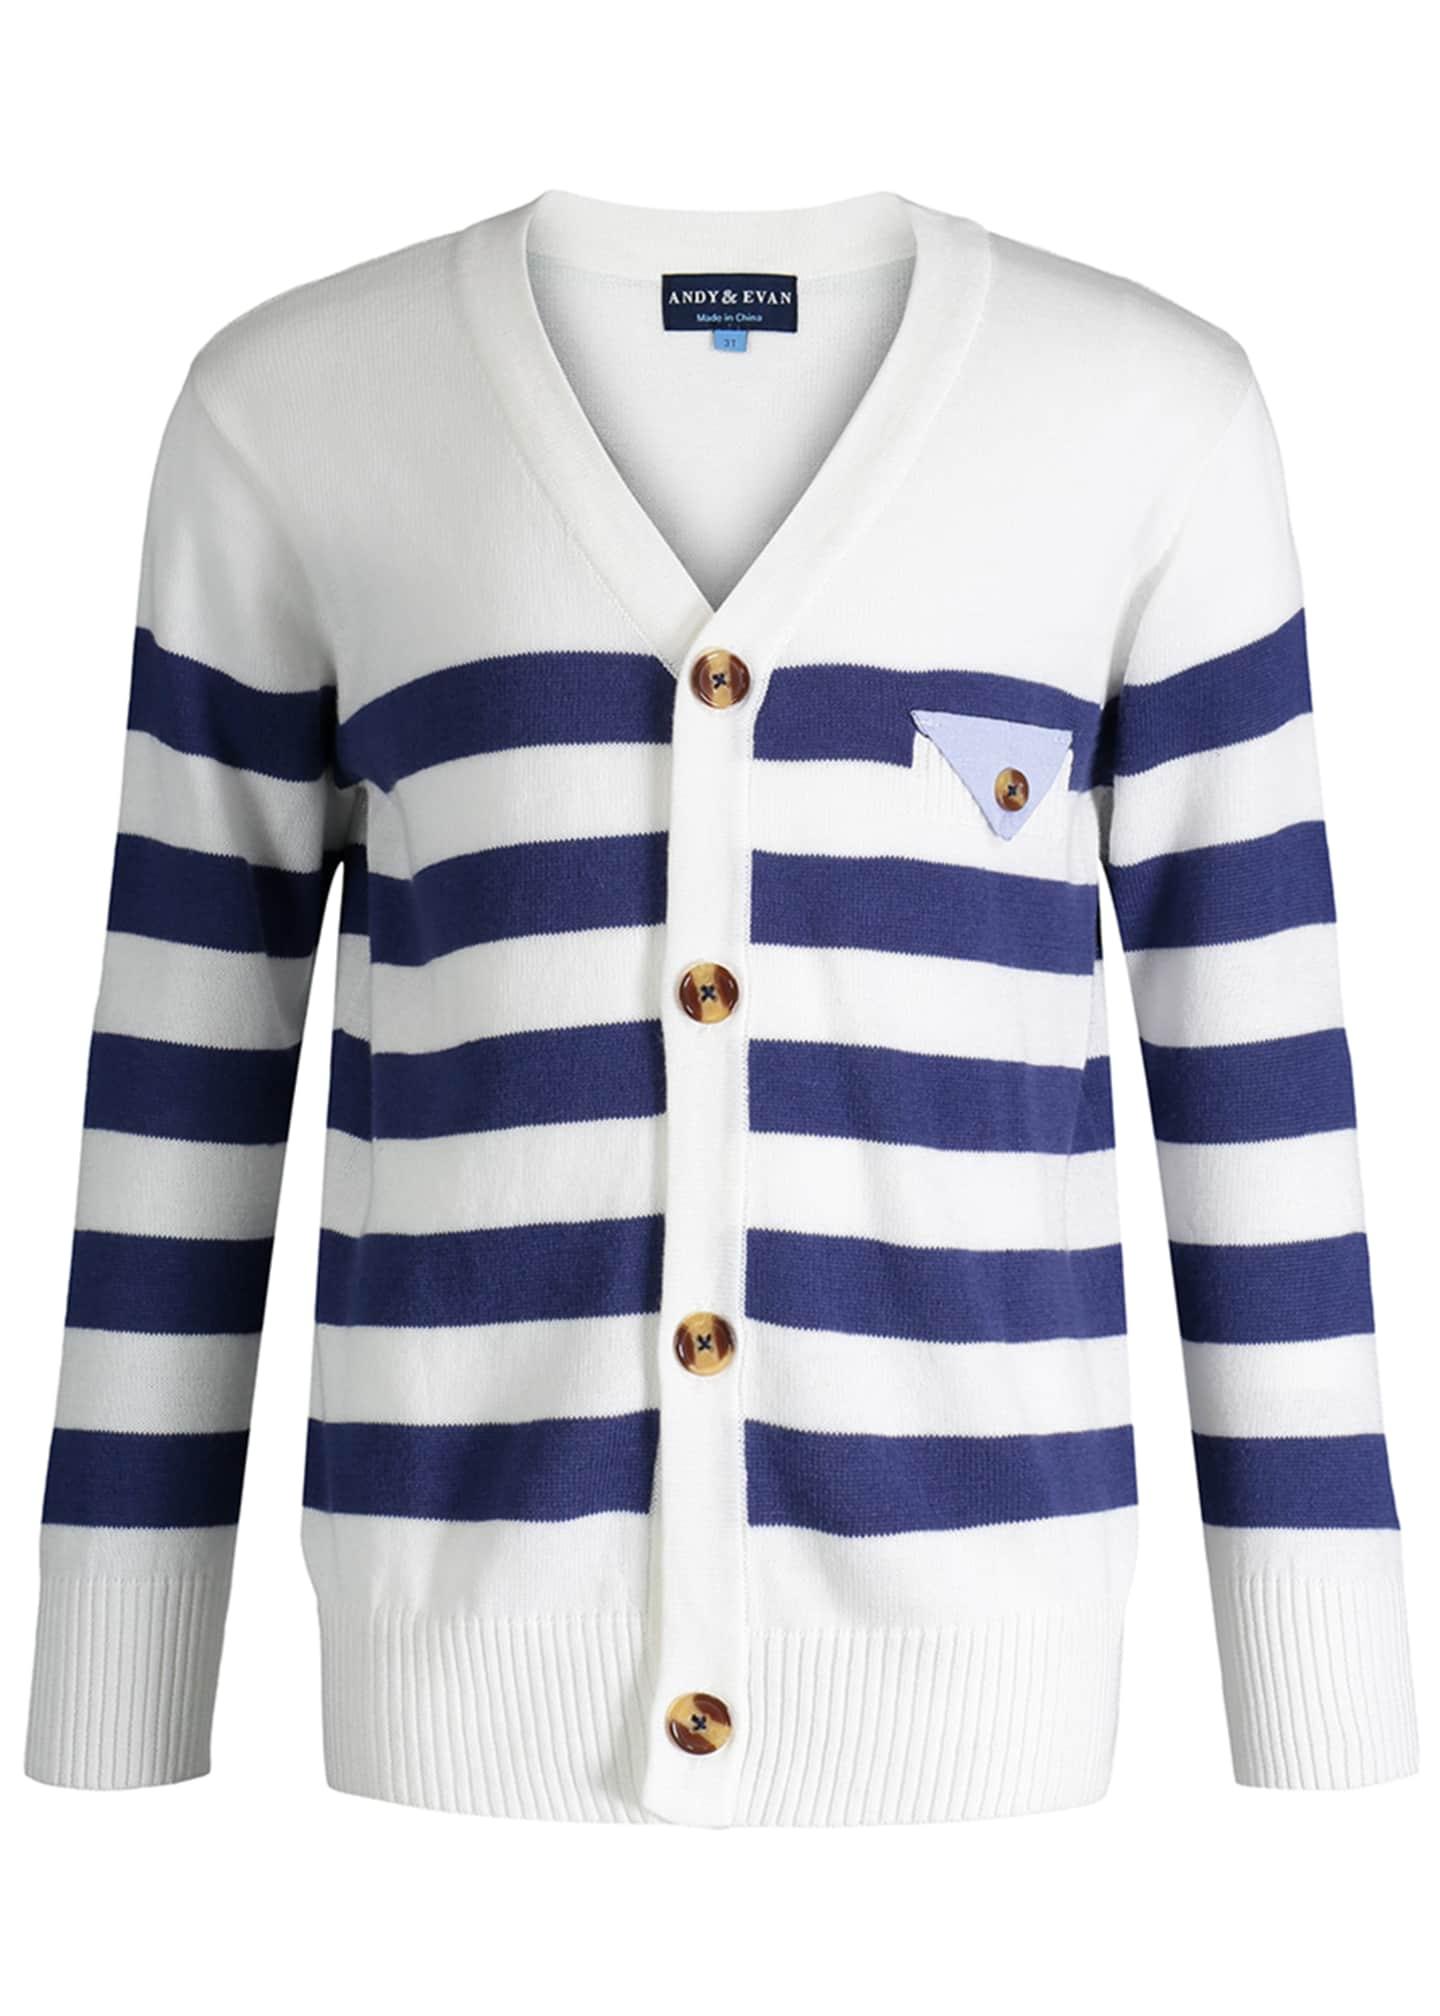 Andy & Evan Varsity Striped Sweater, Size 2-6X